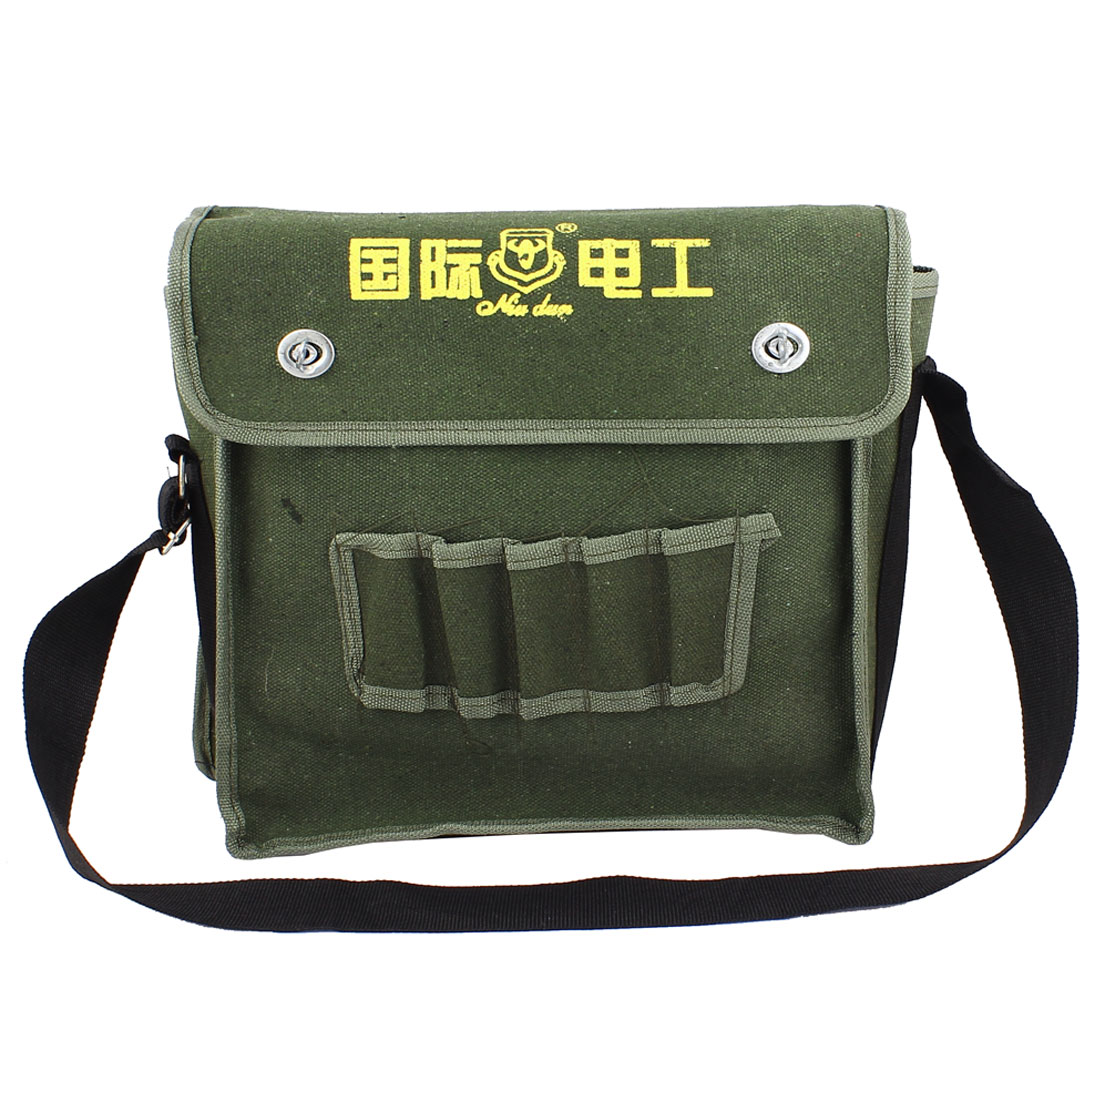 Army Green Canvas Turn Lock Clasp Closure Adjustable Shoulder Strap Electrician Tool Storage Bag Holder